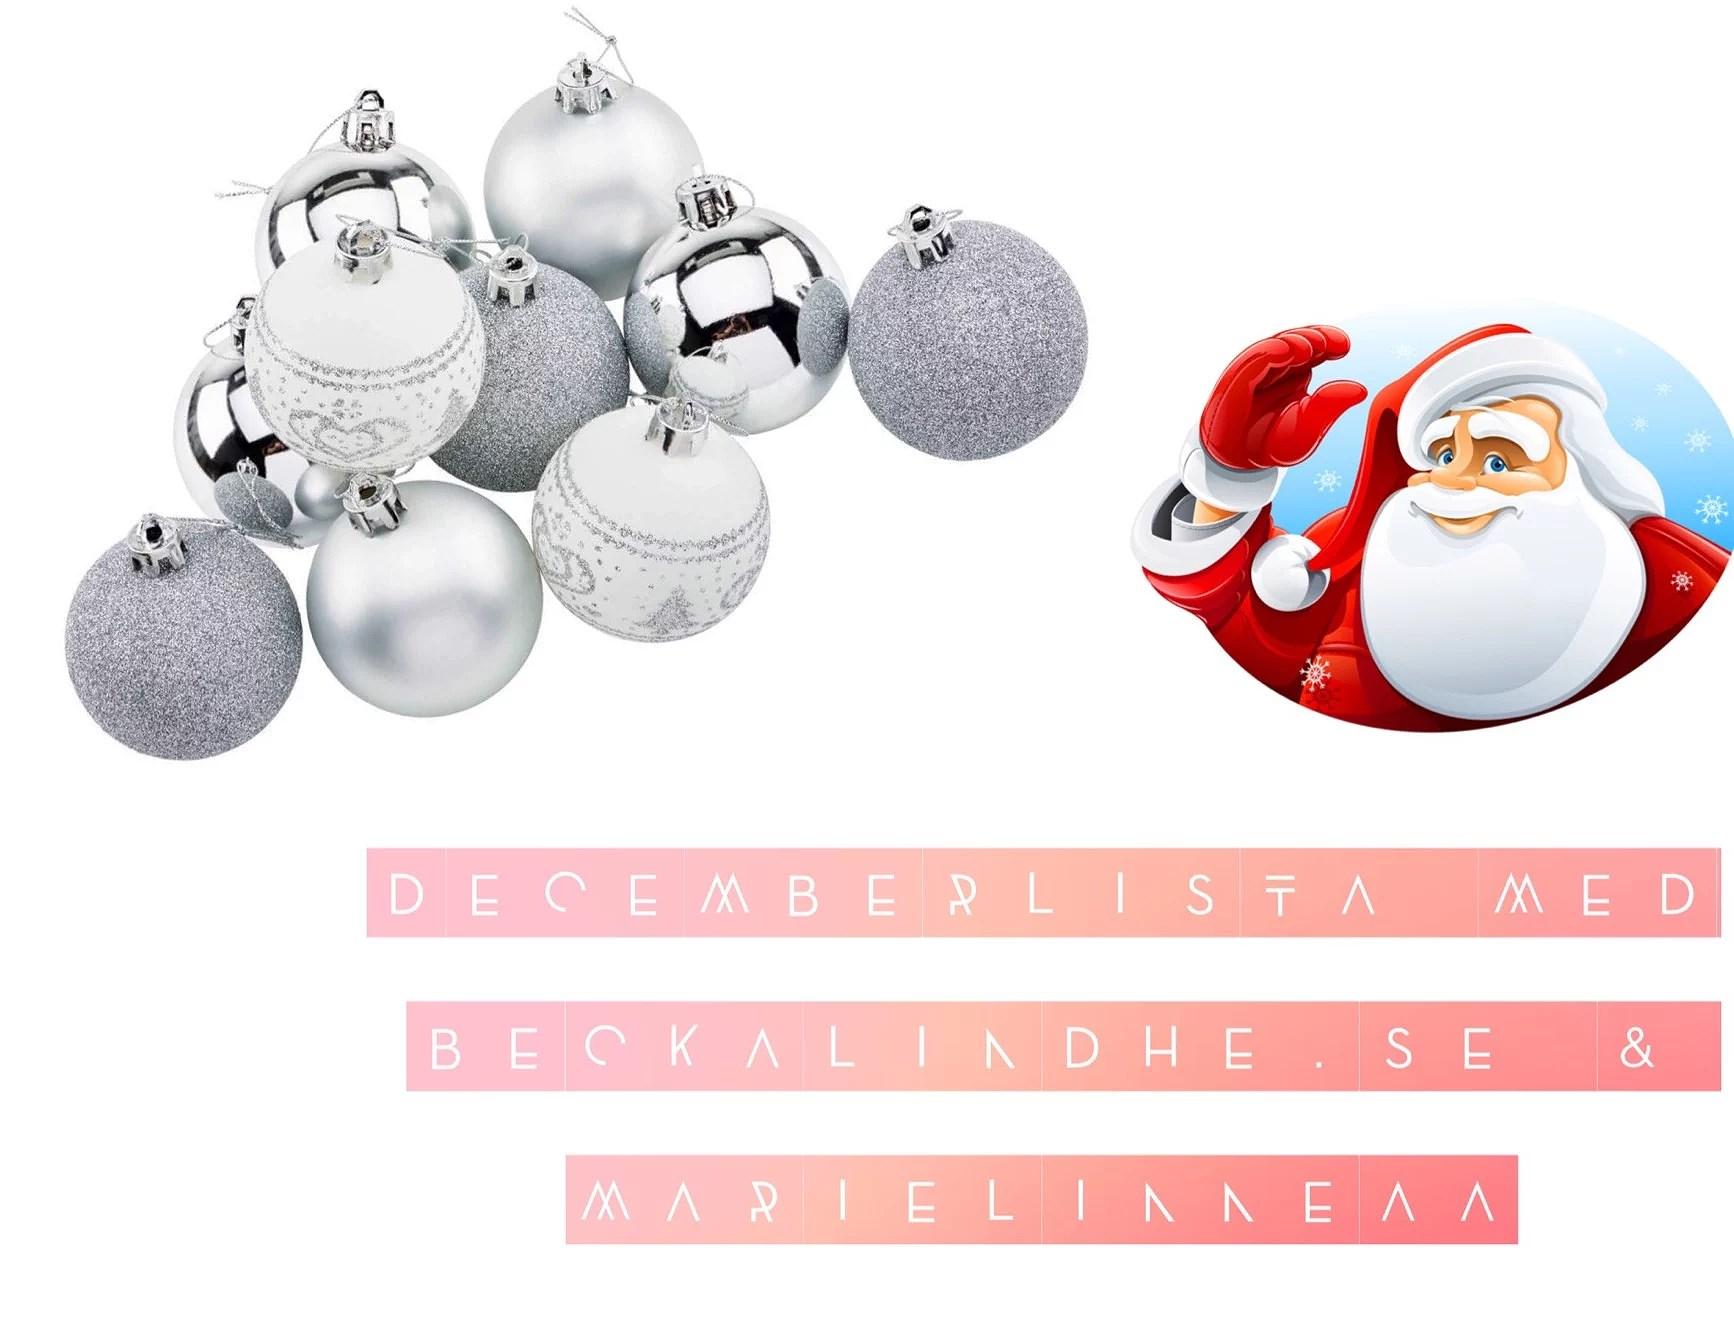 Decemberlista dag 12